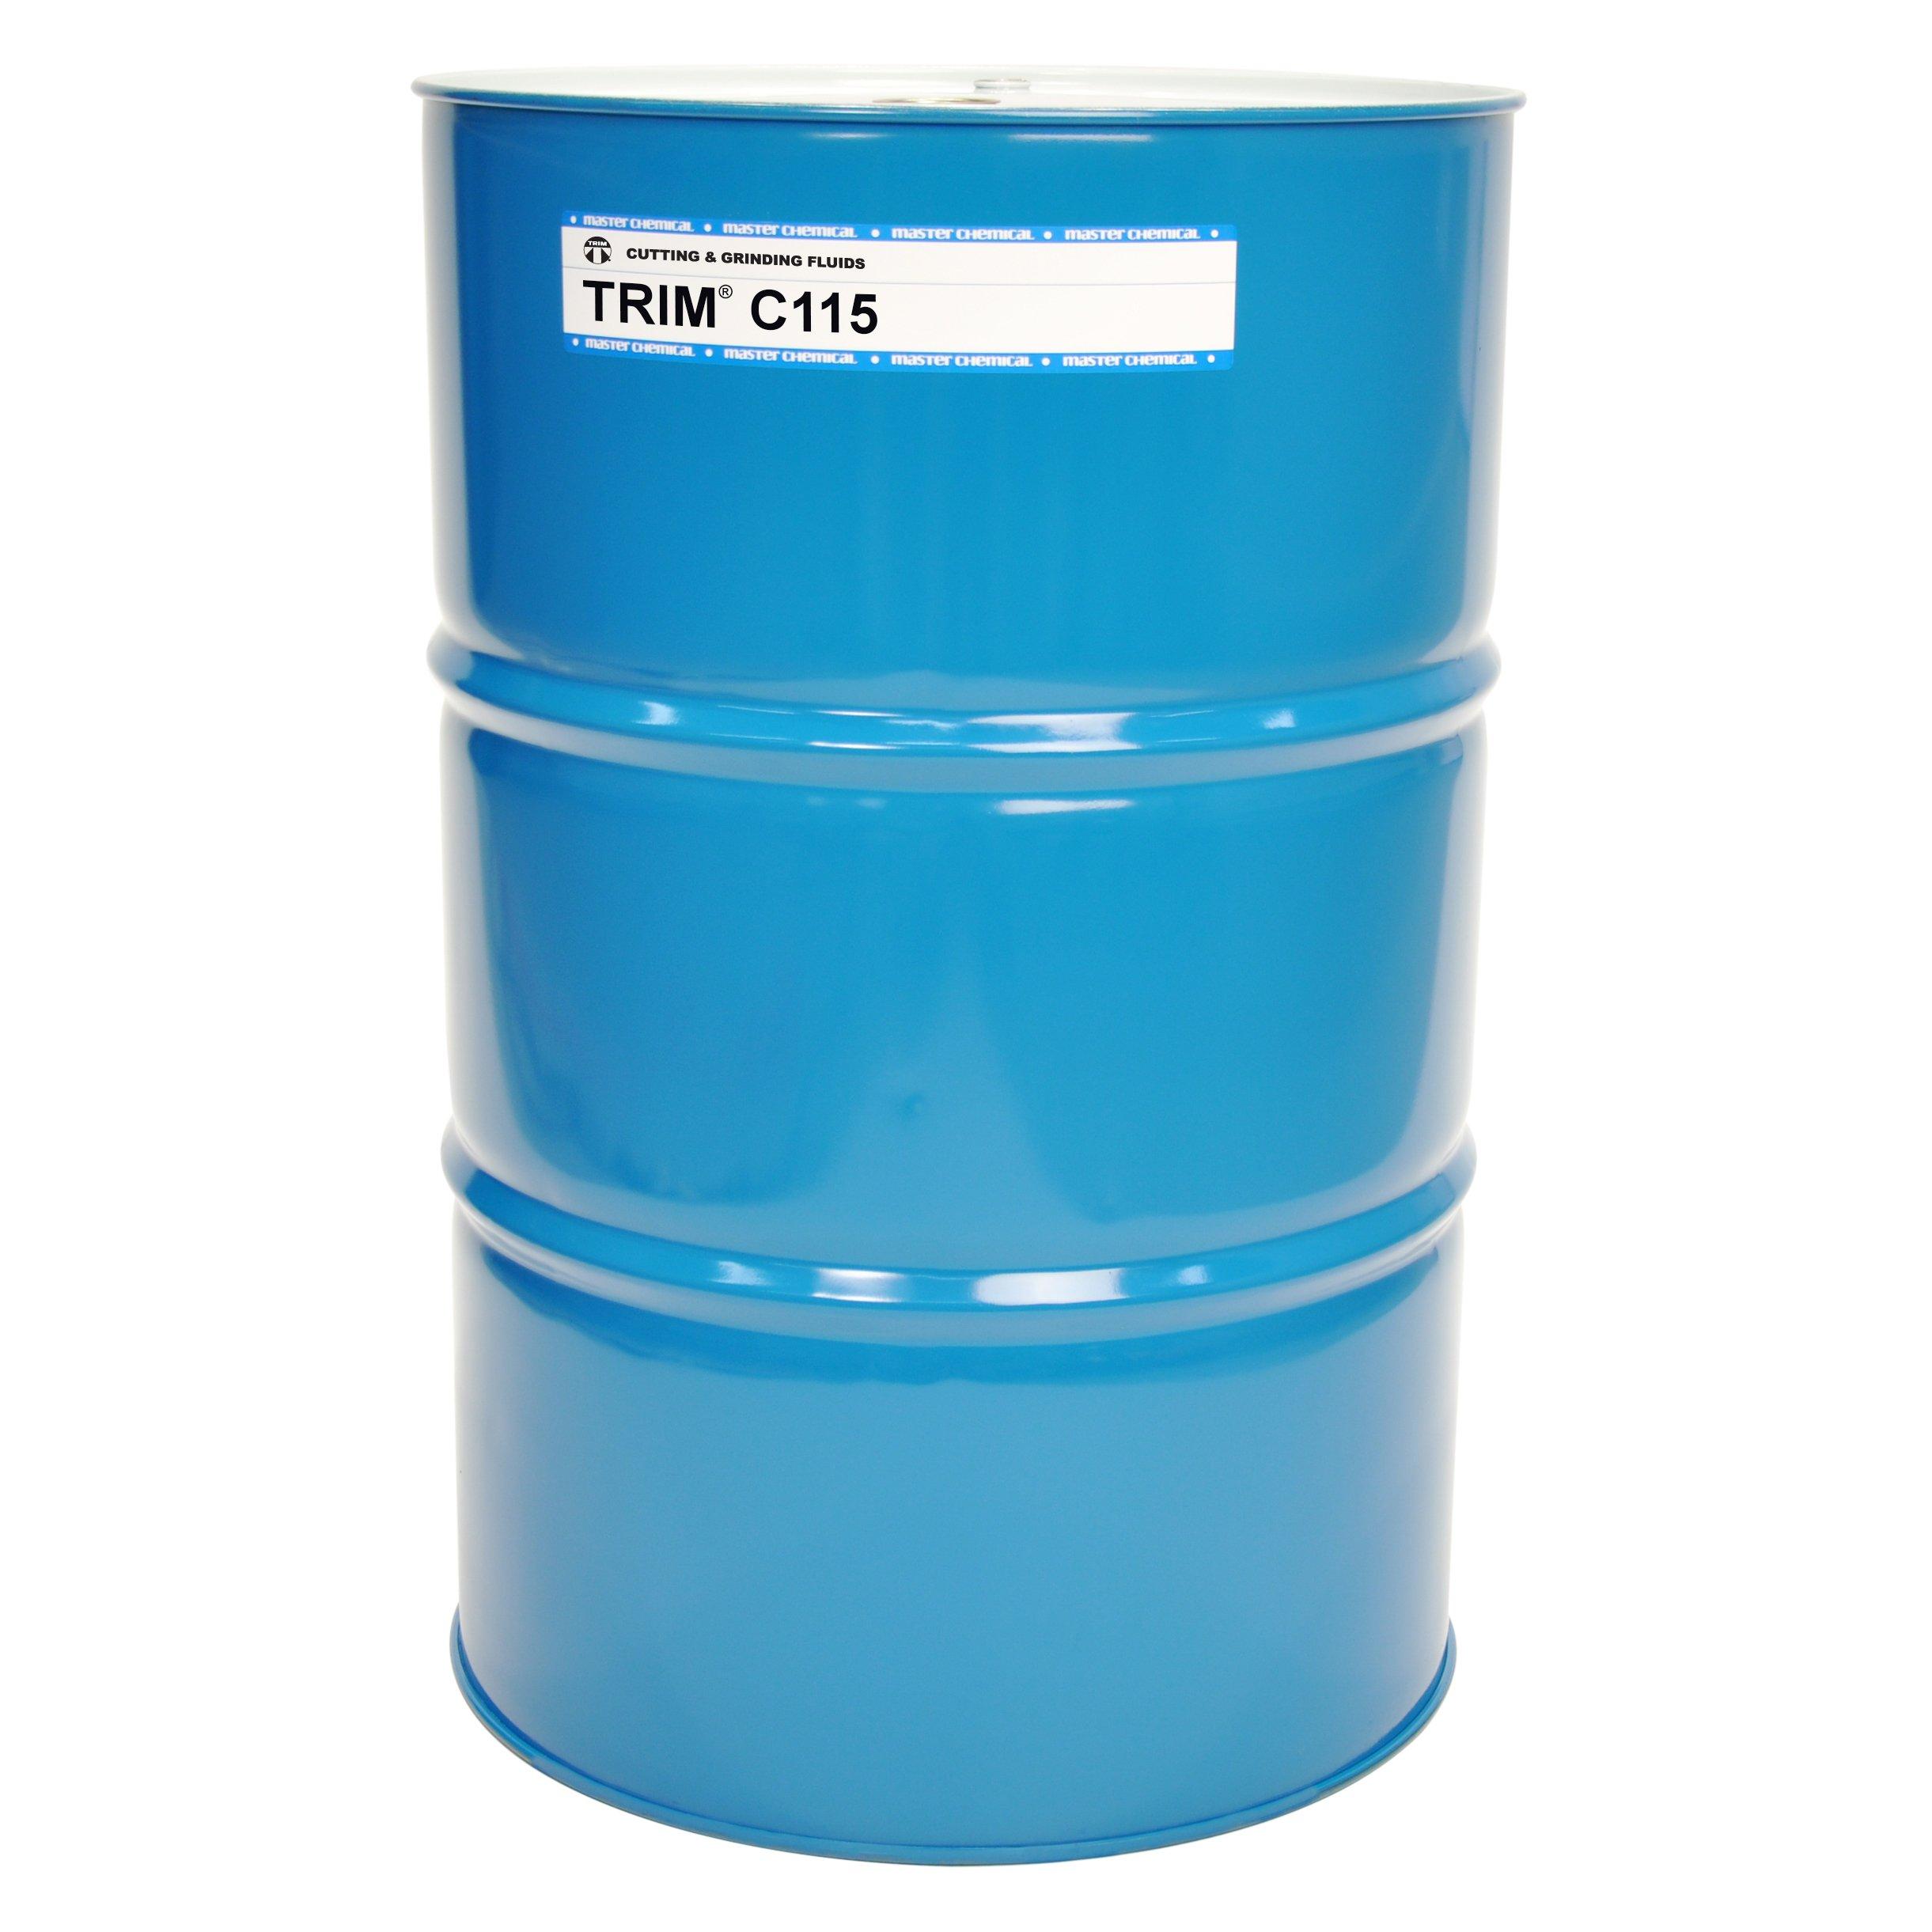 TRIM CUTTING & GRINDING FLUIDS C115/54 C115, Synthetic, 54 gal Drum